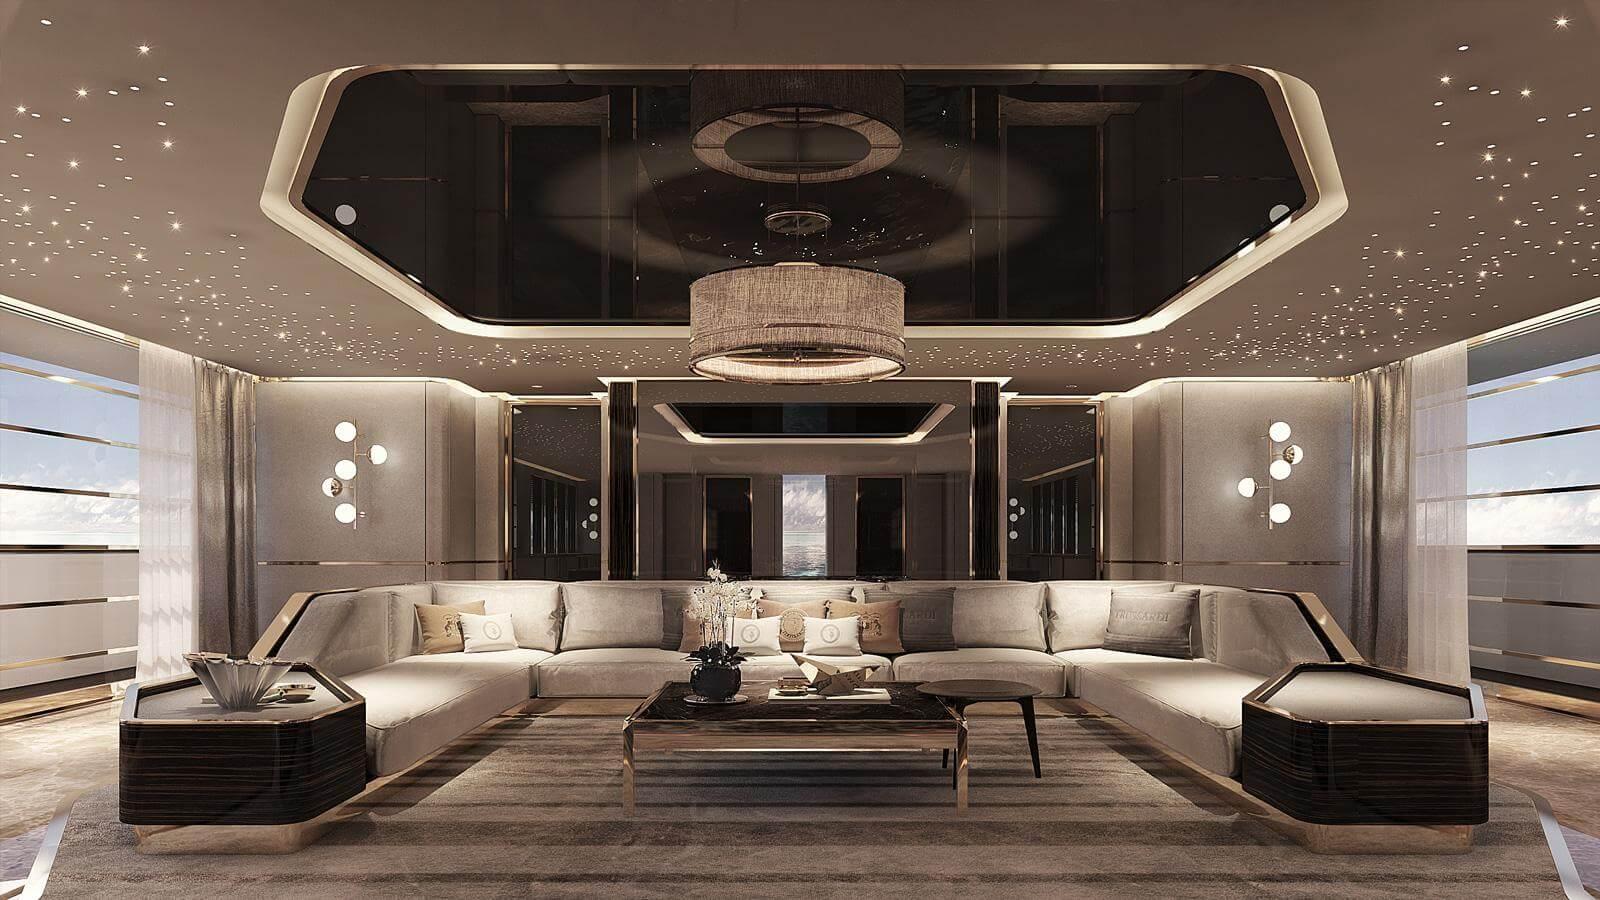 Rossinavi Explorer Yacht Concept Maverick 55 Paolo Nari Design Saloon